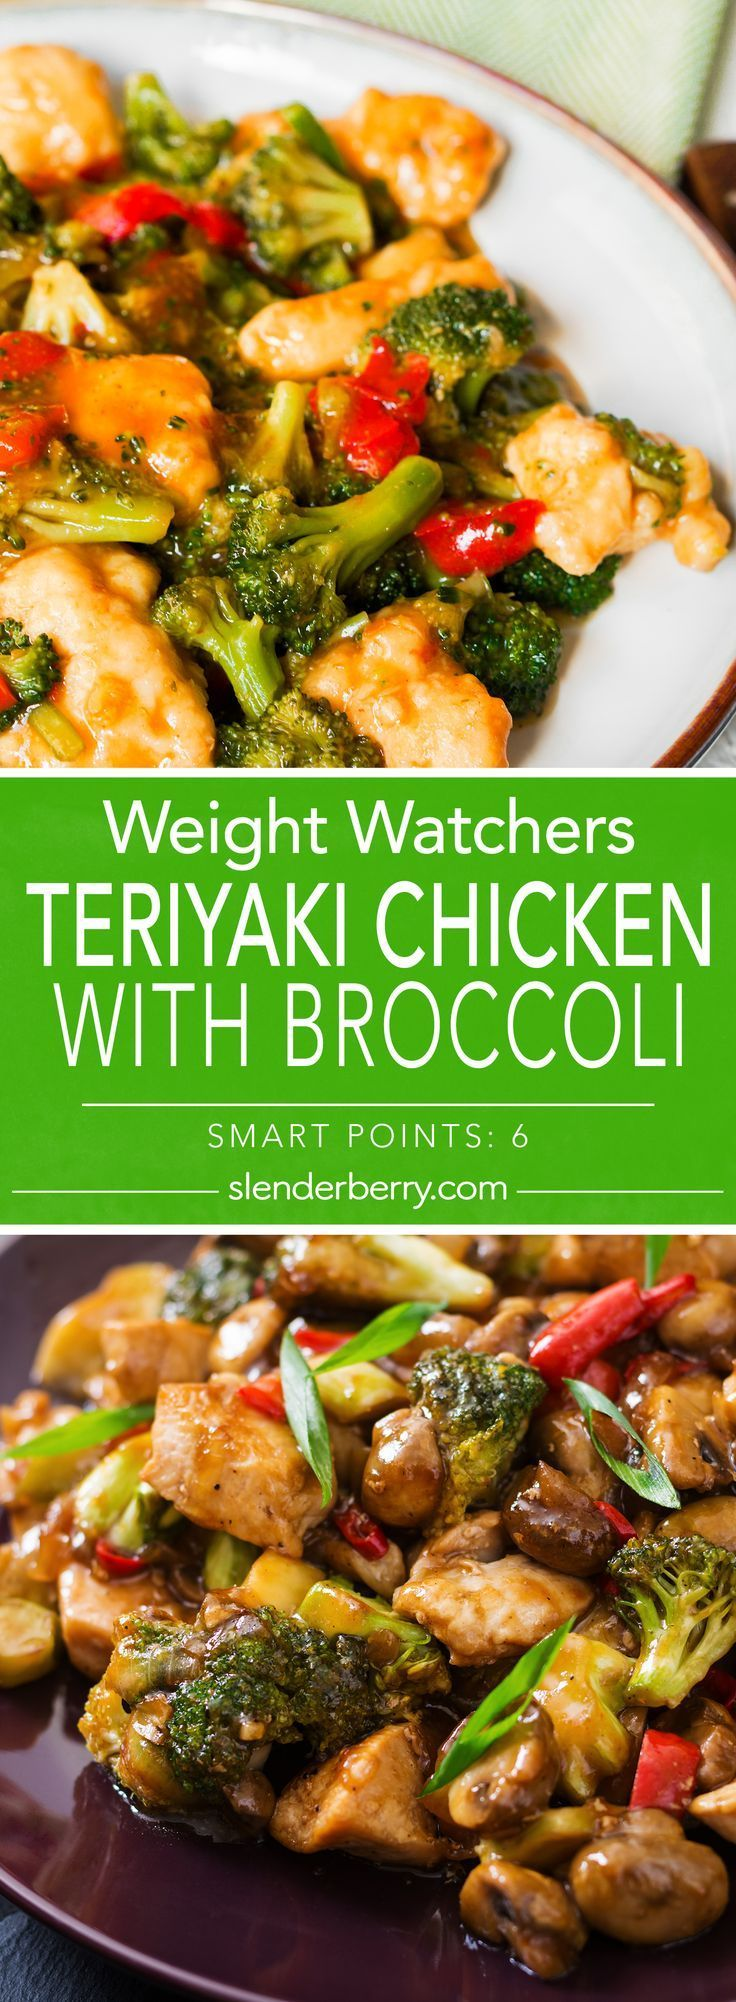 Weight Watchers Teriyaki Chicken with Broccoli Recipe with garlic, onion, chicke…